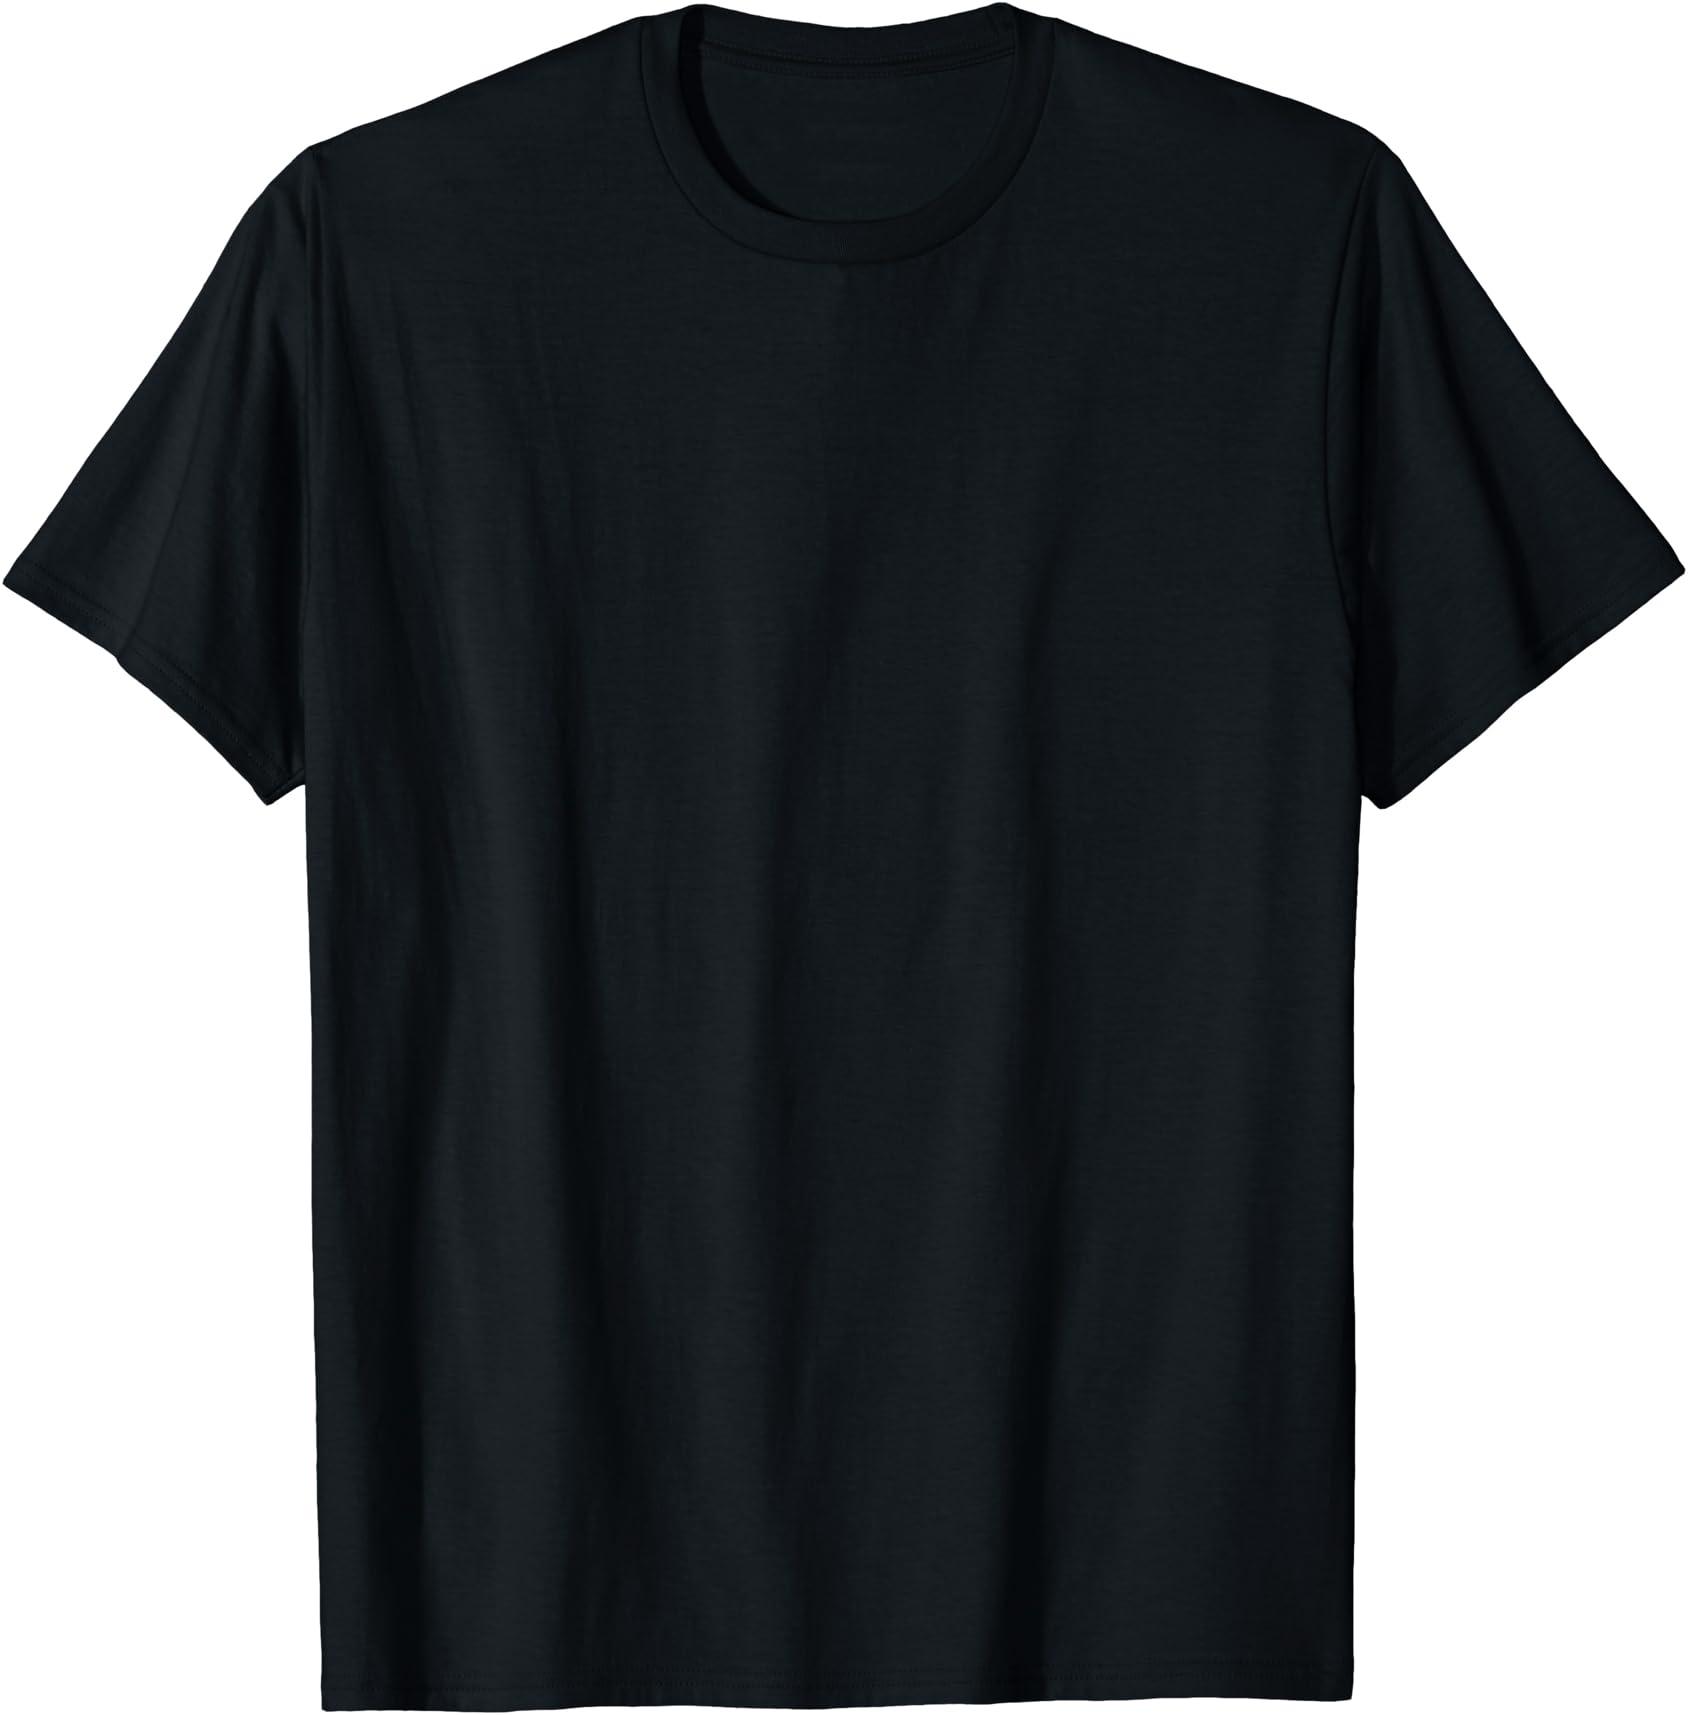 Children/'s Tee Shirt  featuring  JUSTICE LEAGUE quality cotton Kids T Shirt